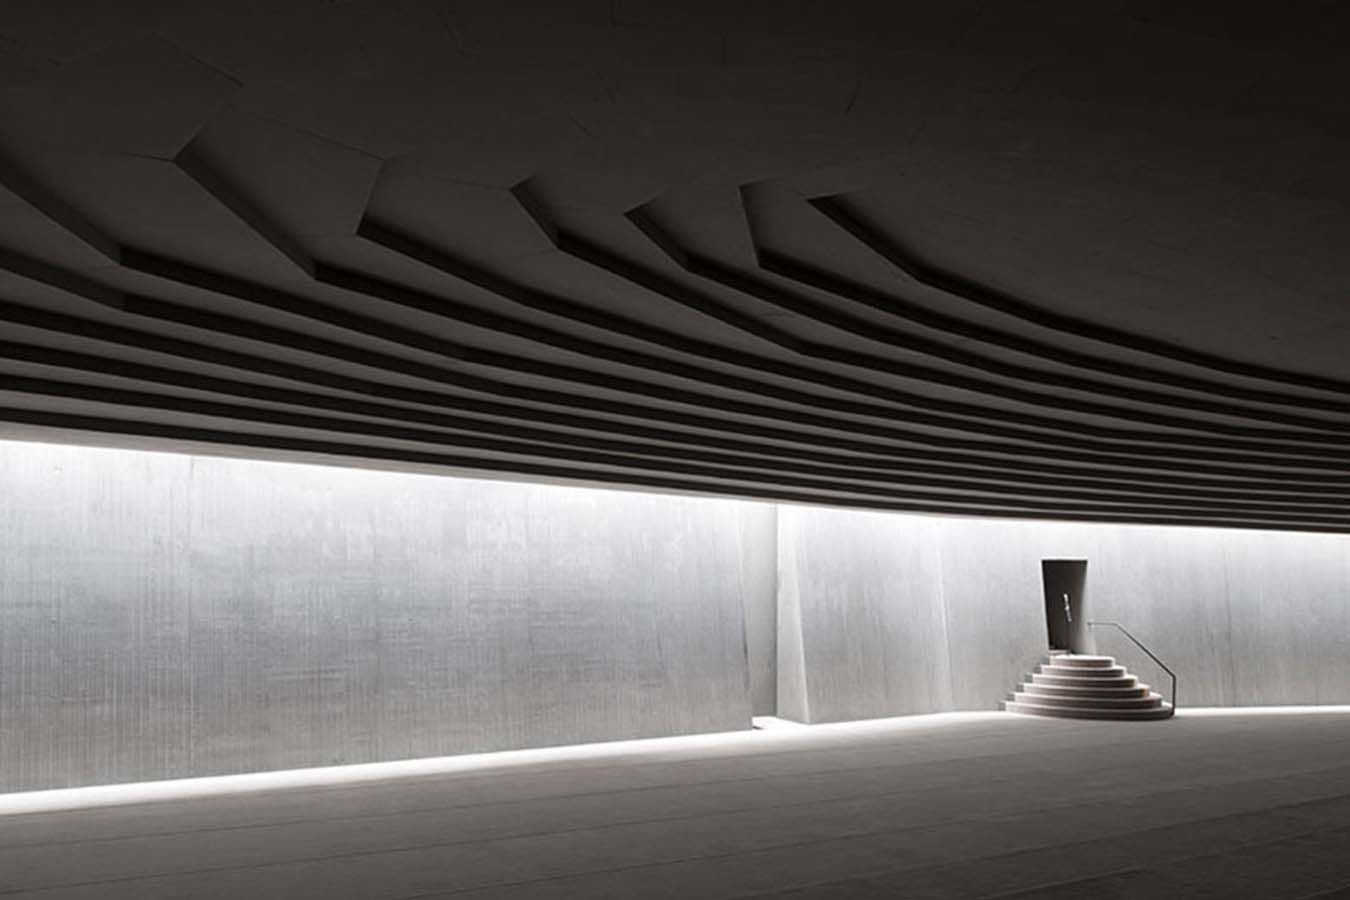 08-Emre-Arolat-Architects-Sancaklar-Mosque